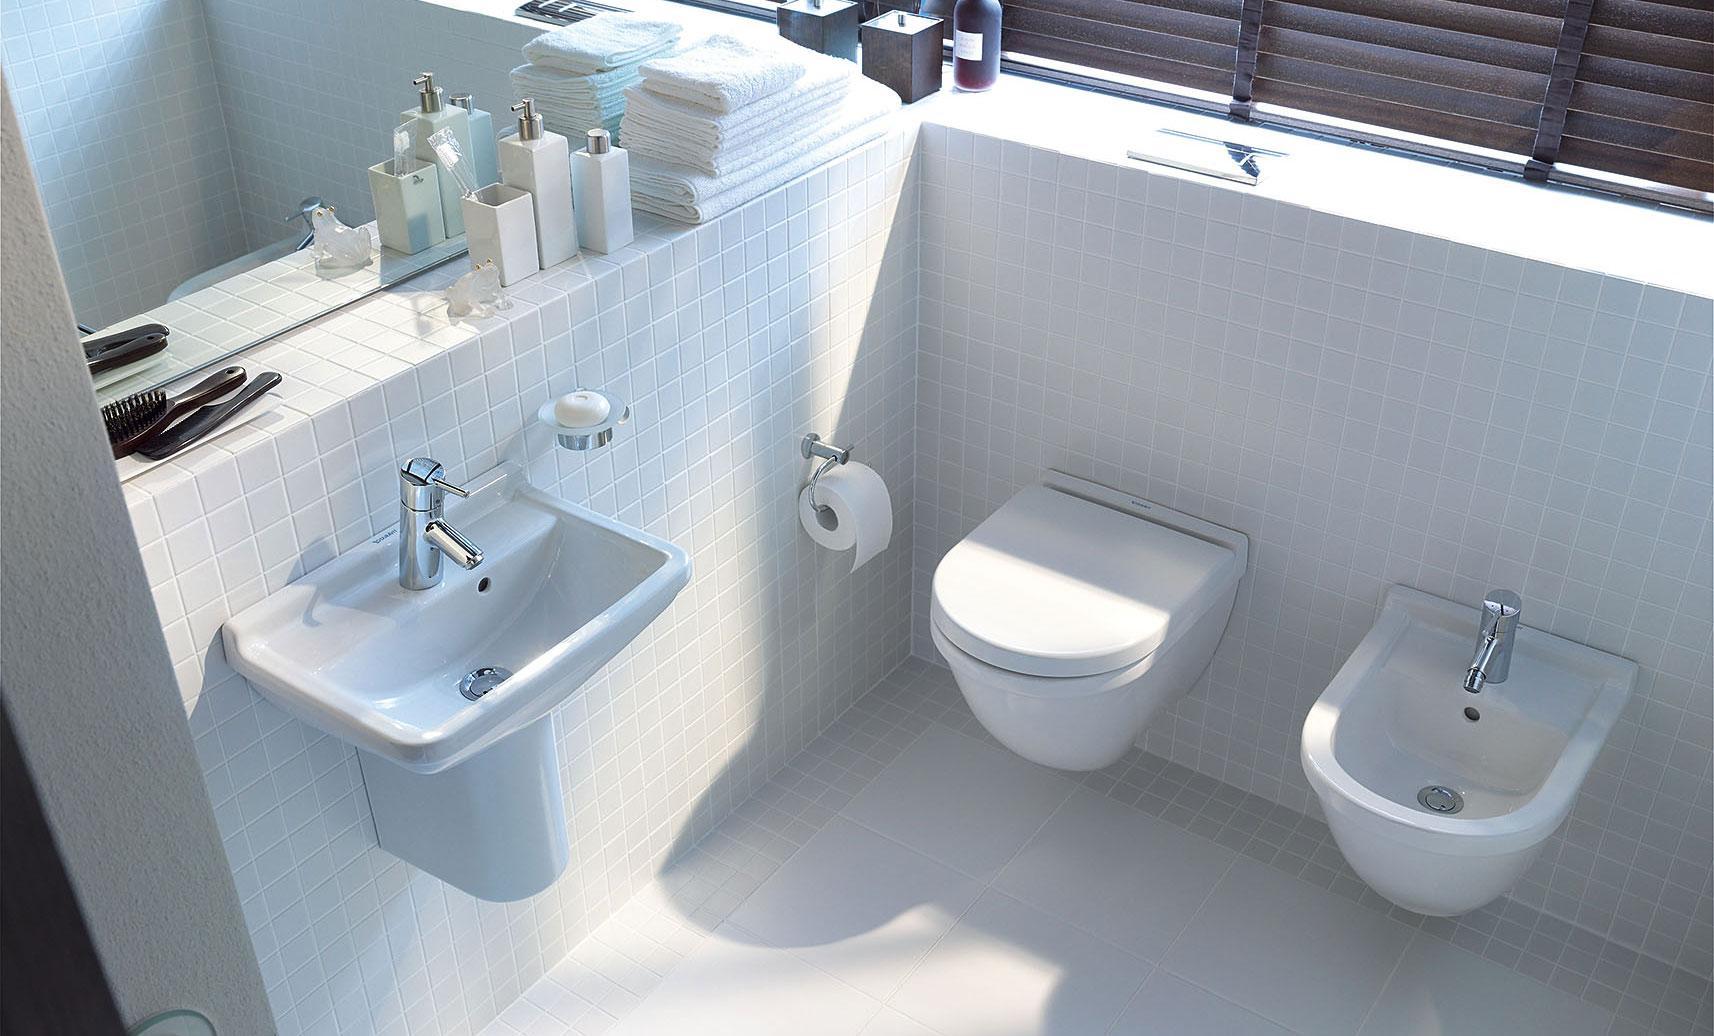 Gaestebadevaerelse Ideer Til Sma Badevaerelser Duravit